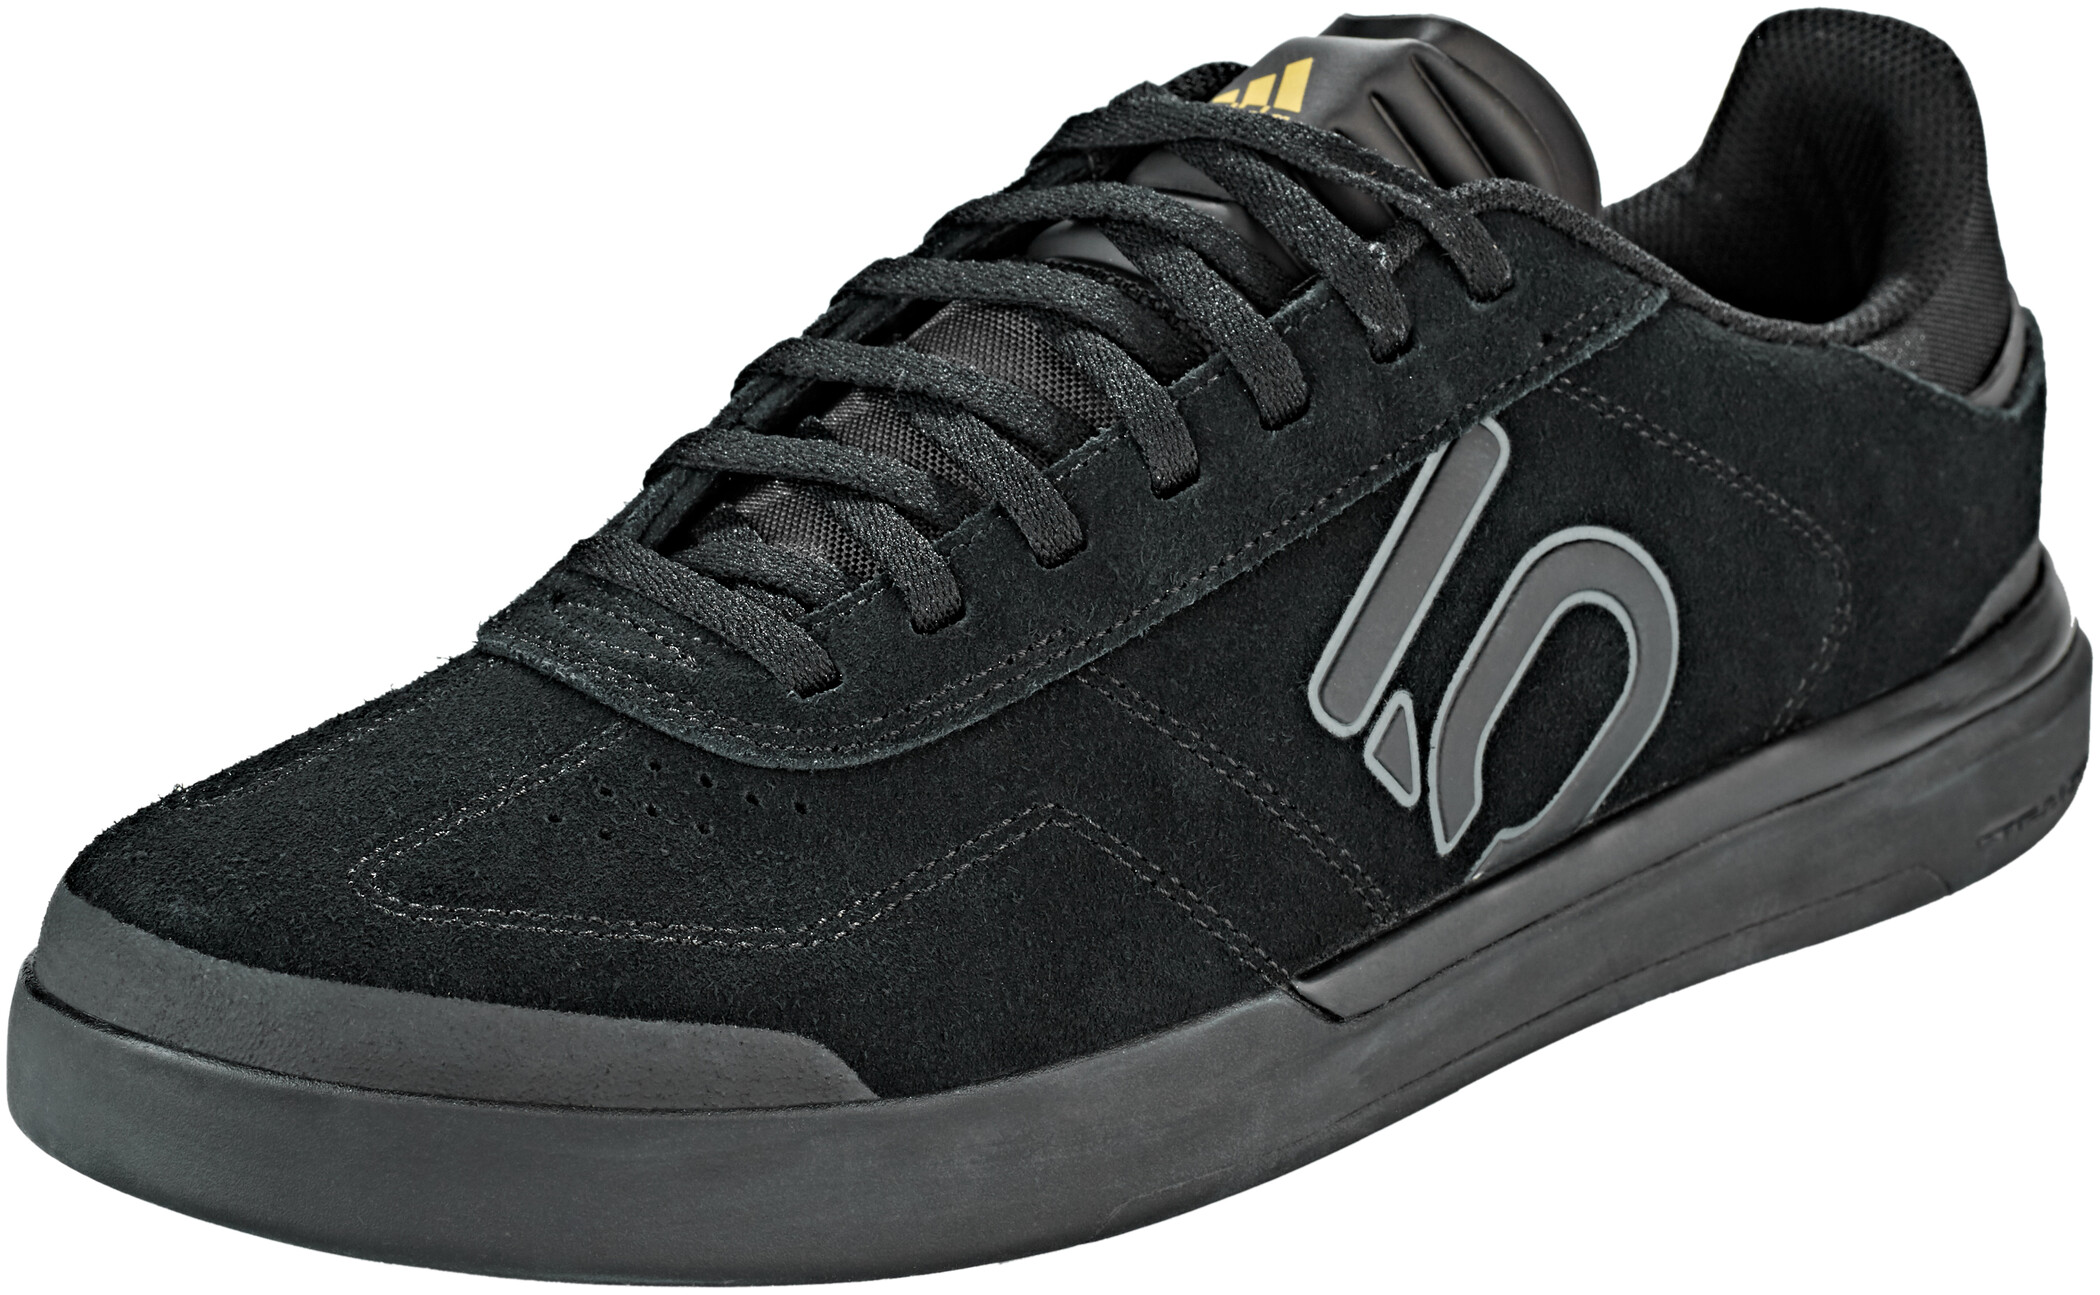 adidas Five Ten Sleuth DLX Mountain Bike Schuhe Herren